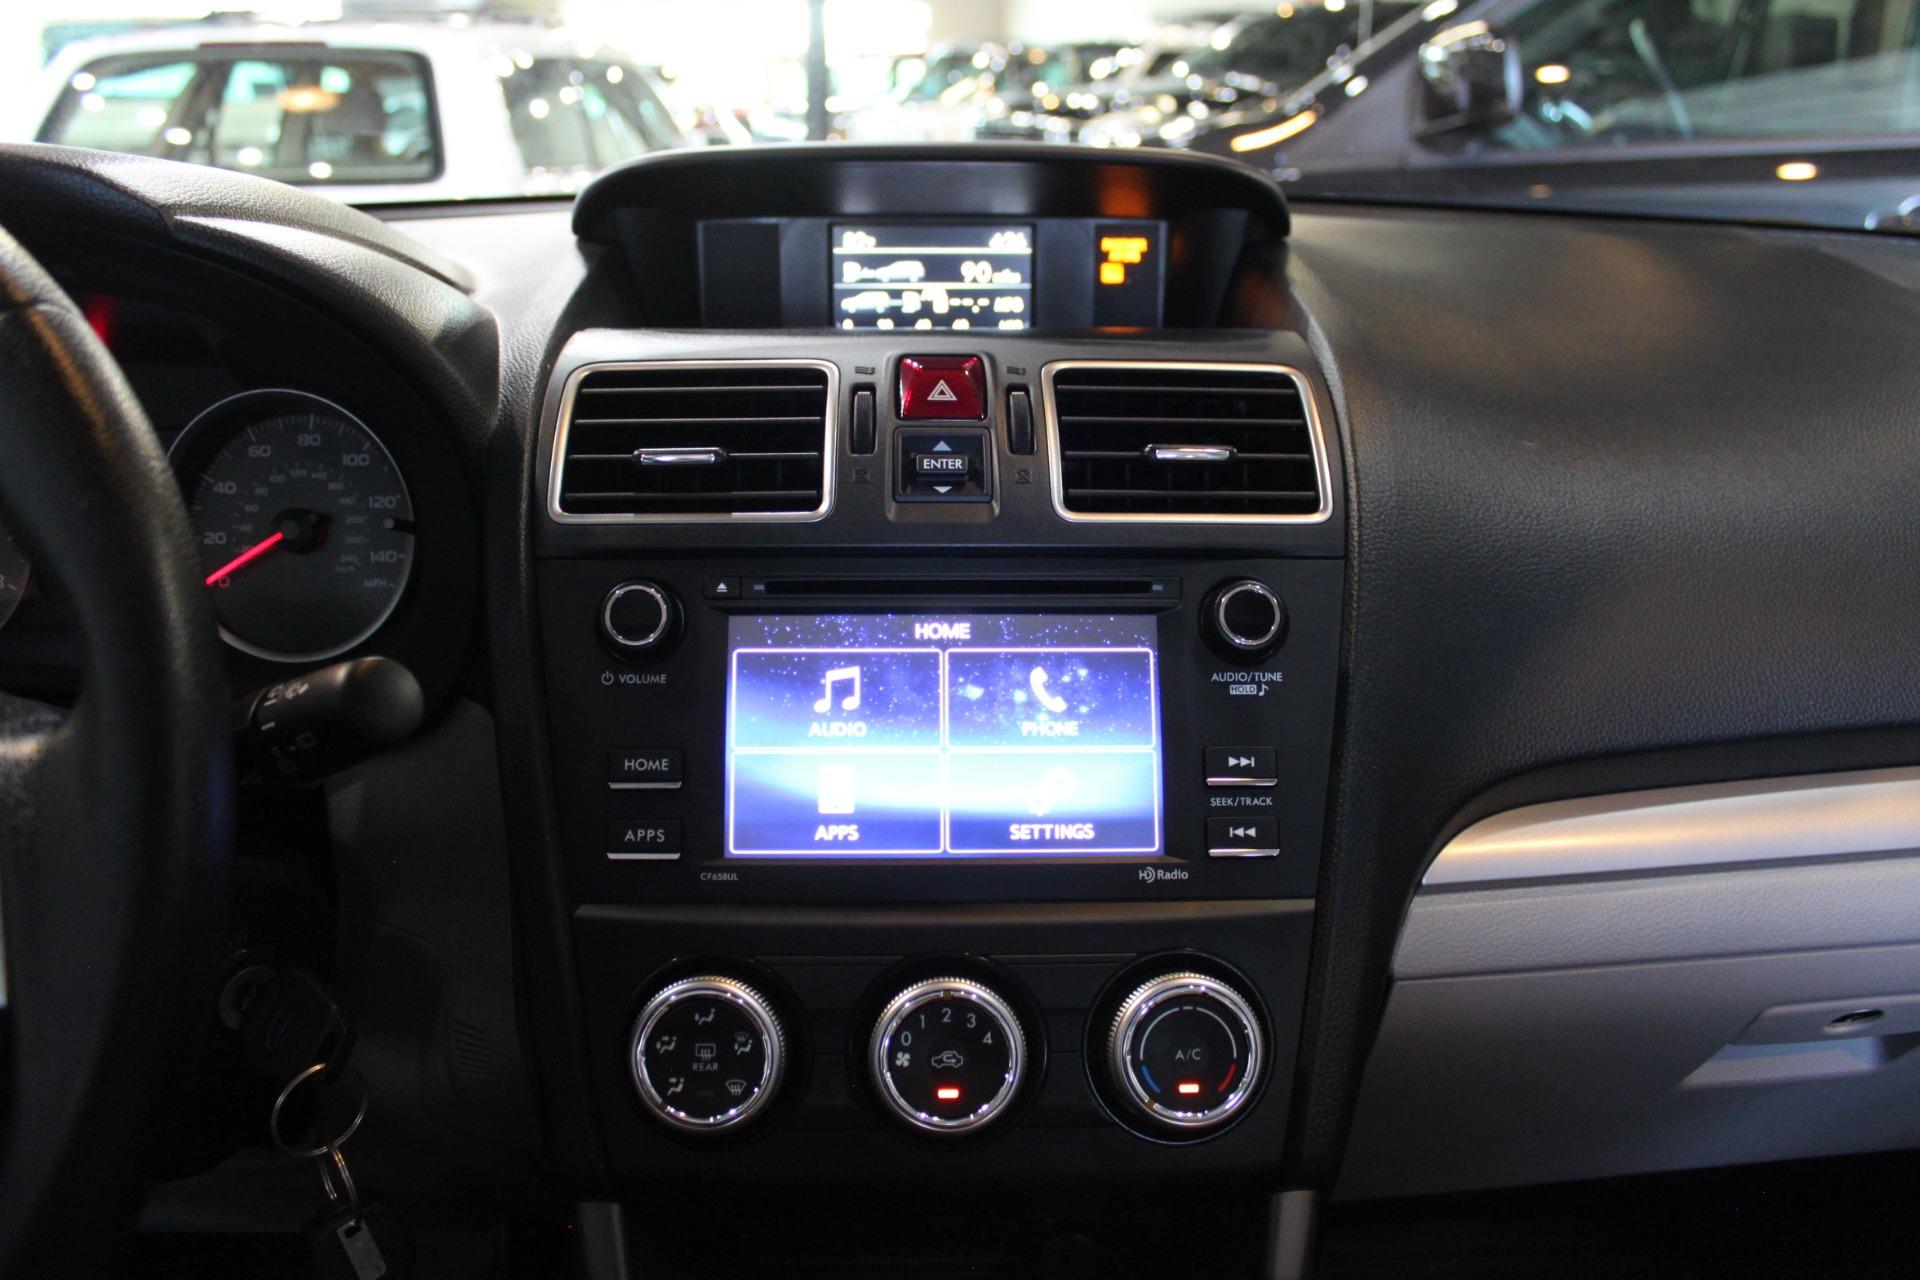 Used-2017-Subaru-Forester-25i-All-Wheel-Drive-25i-Wagoneer